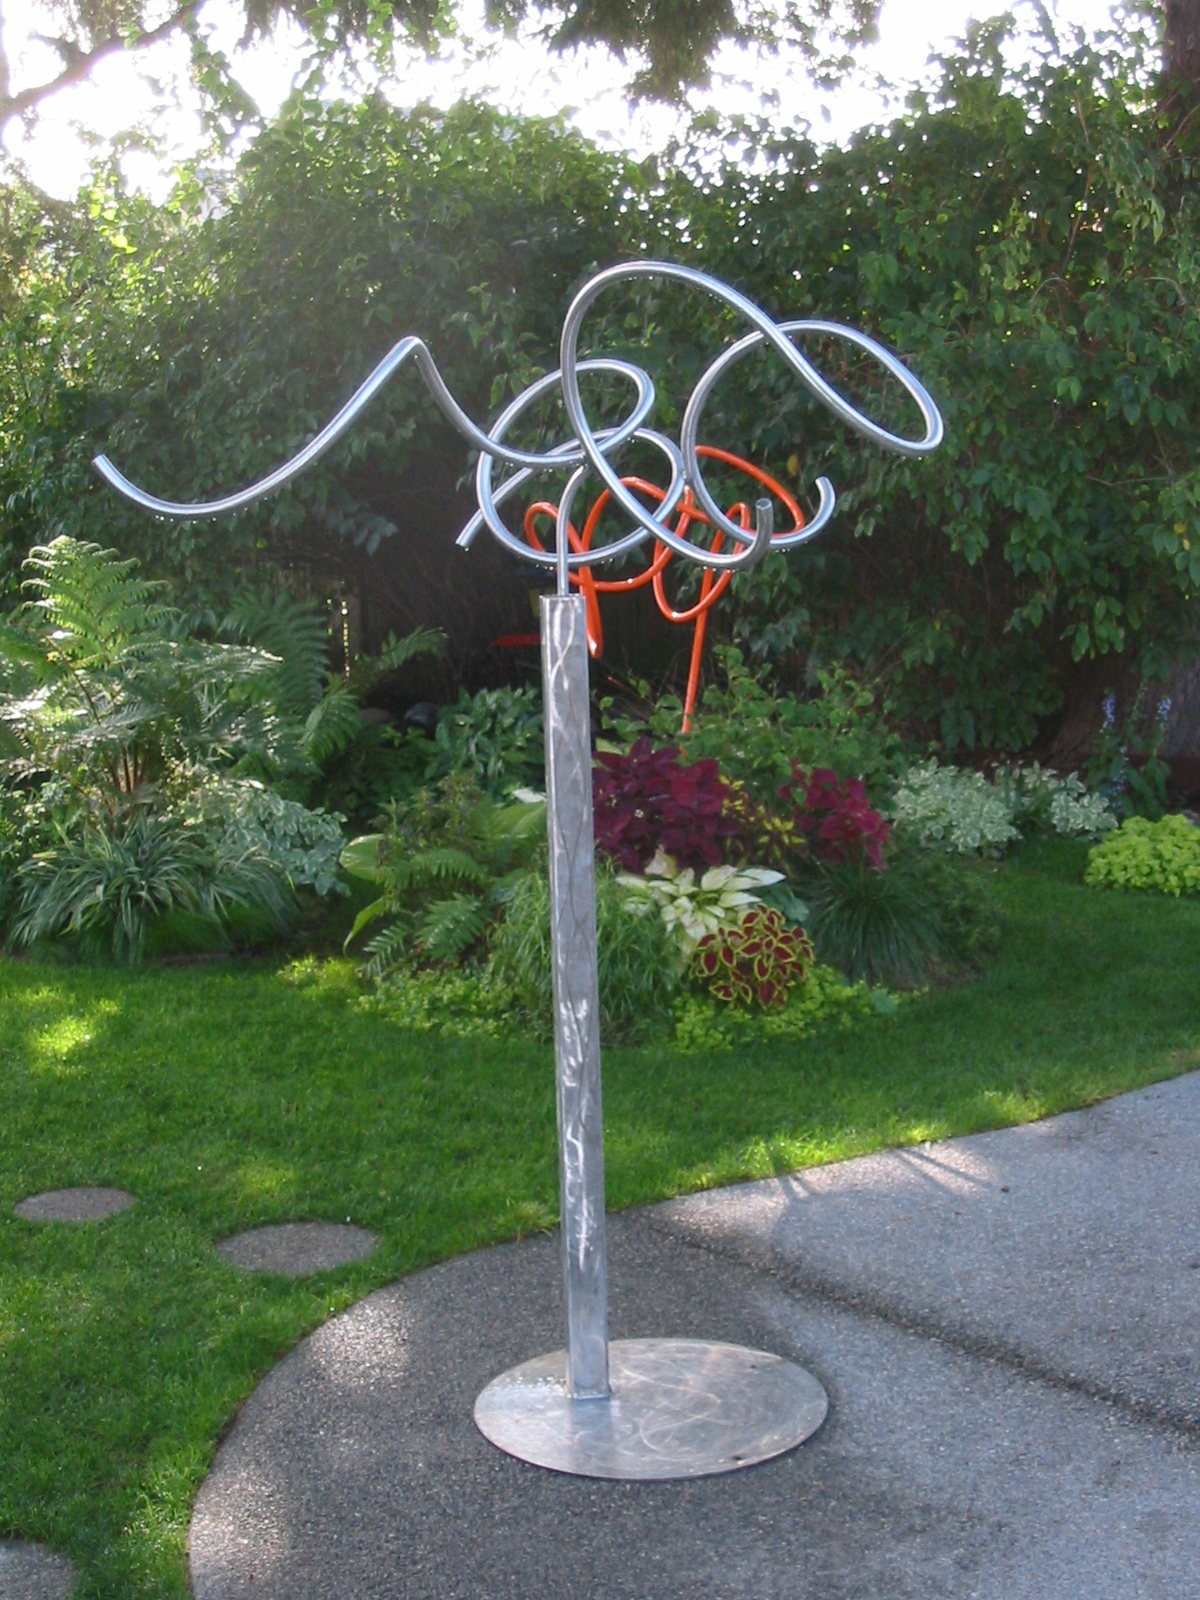 modfountain-sculptures-los-angeles-16.JPG